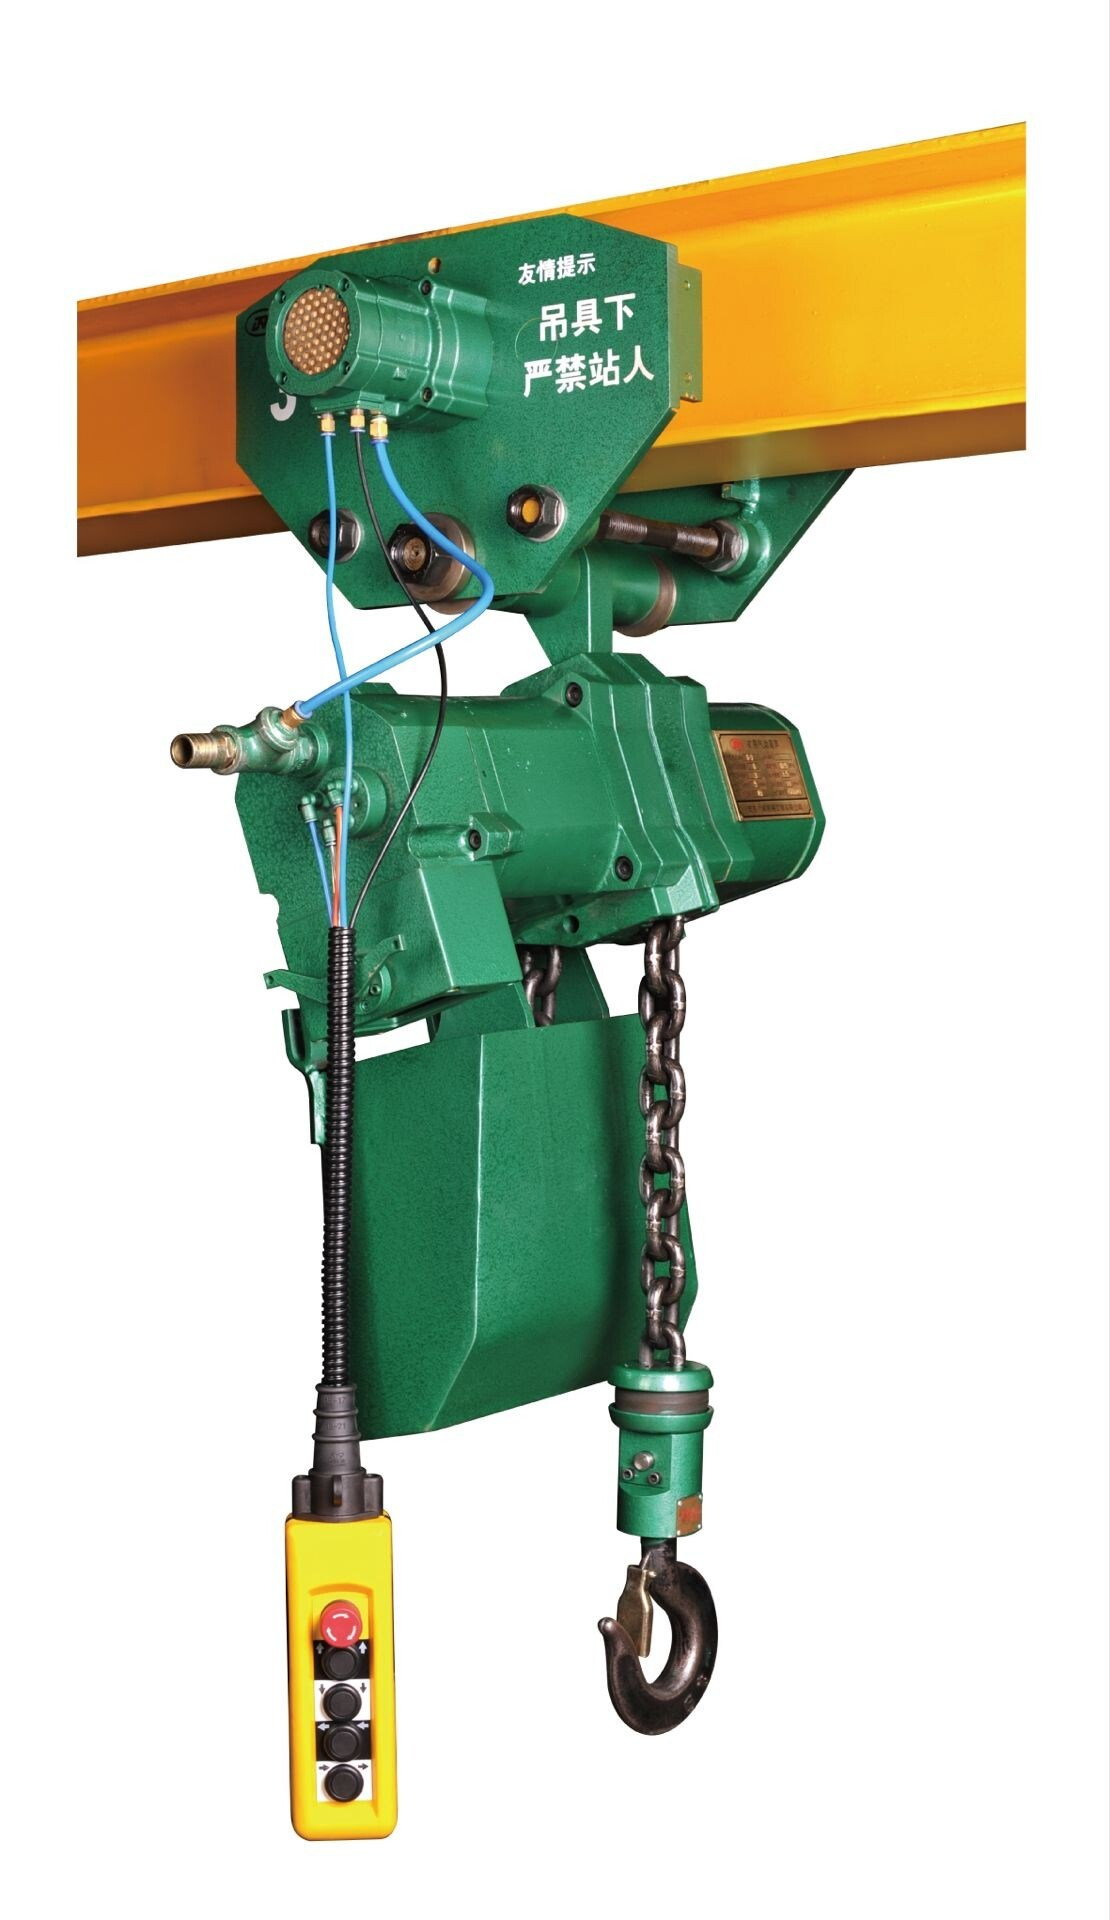 China Supplier 1 Ton3 Phase 220V380V410V Cdii/Mdiitype Electrical Hoist